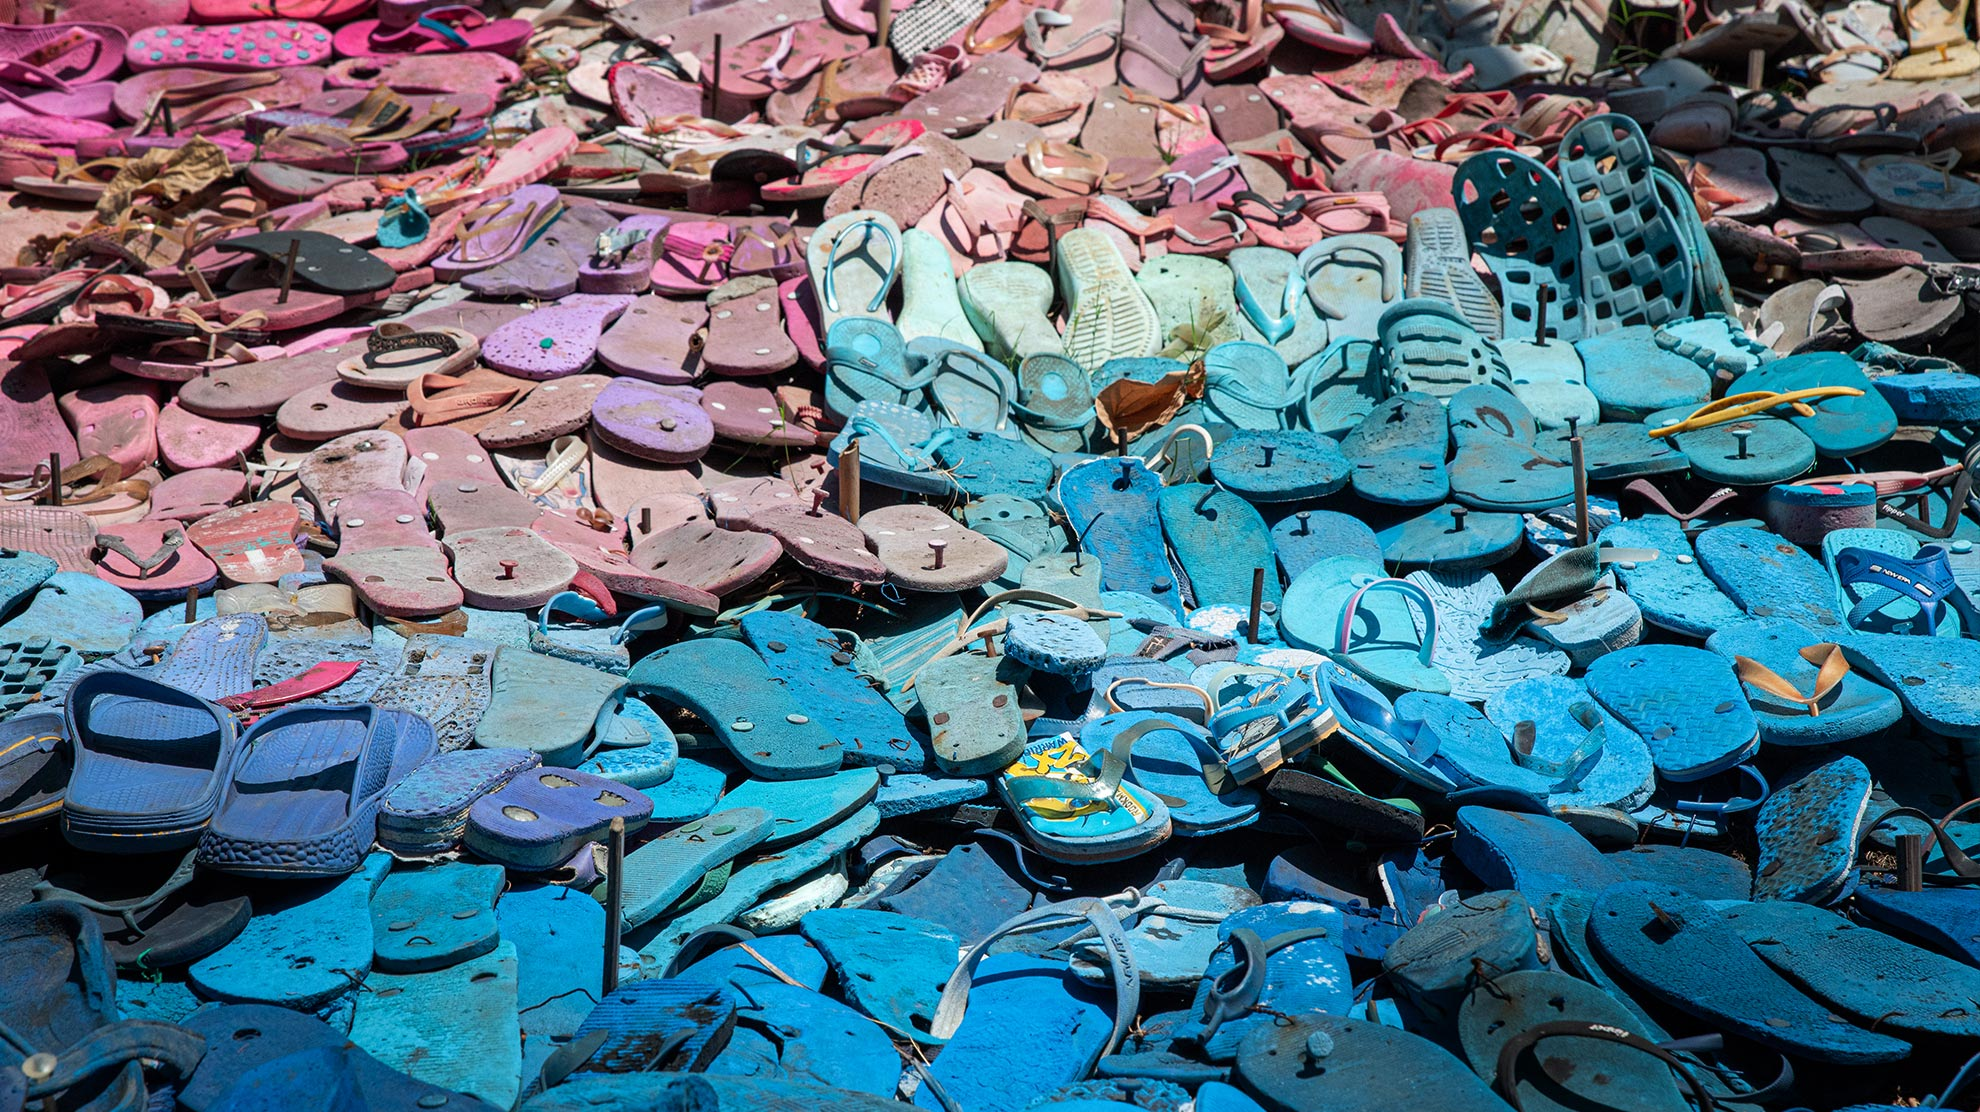 Seeking eco-friendly beachwear? Try flip-flops made of algae